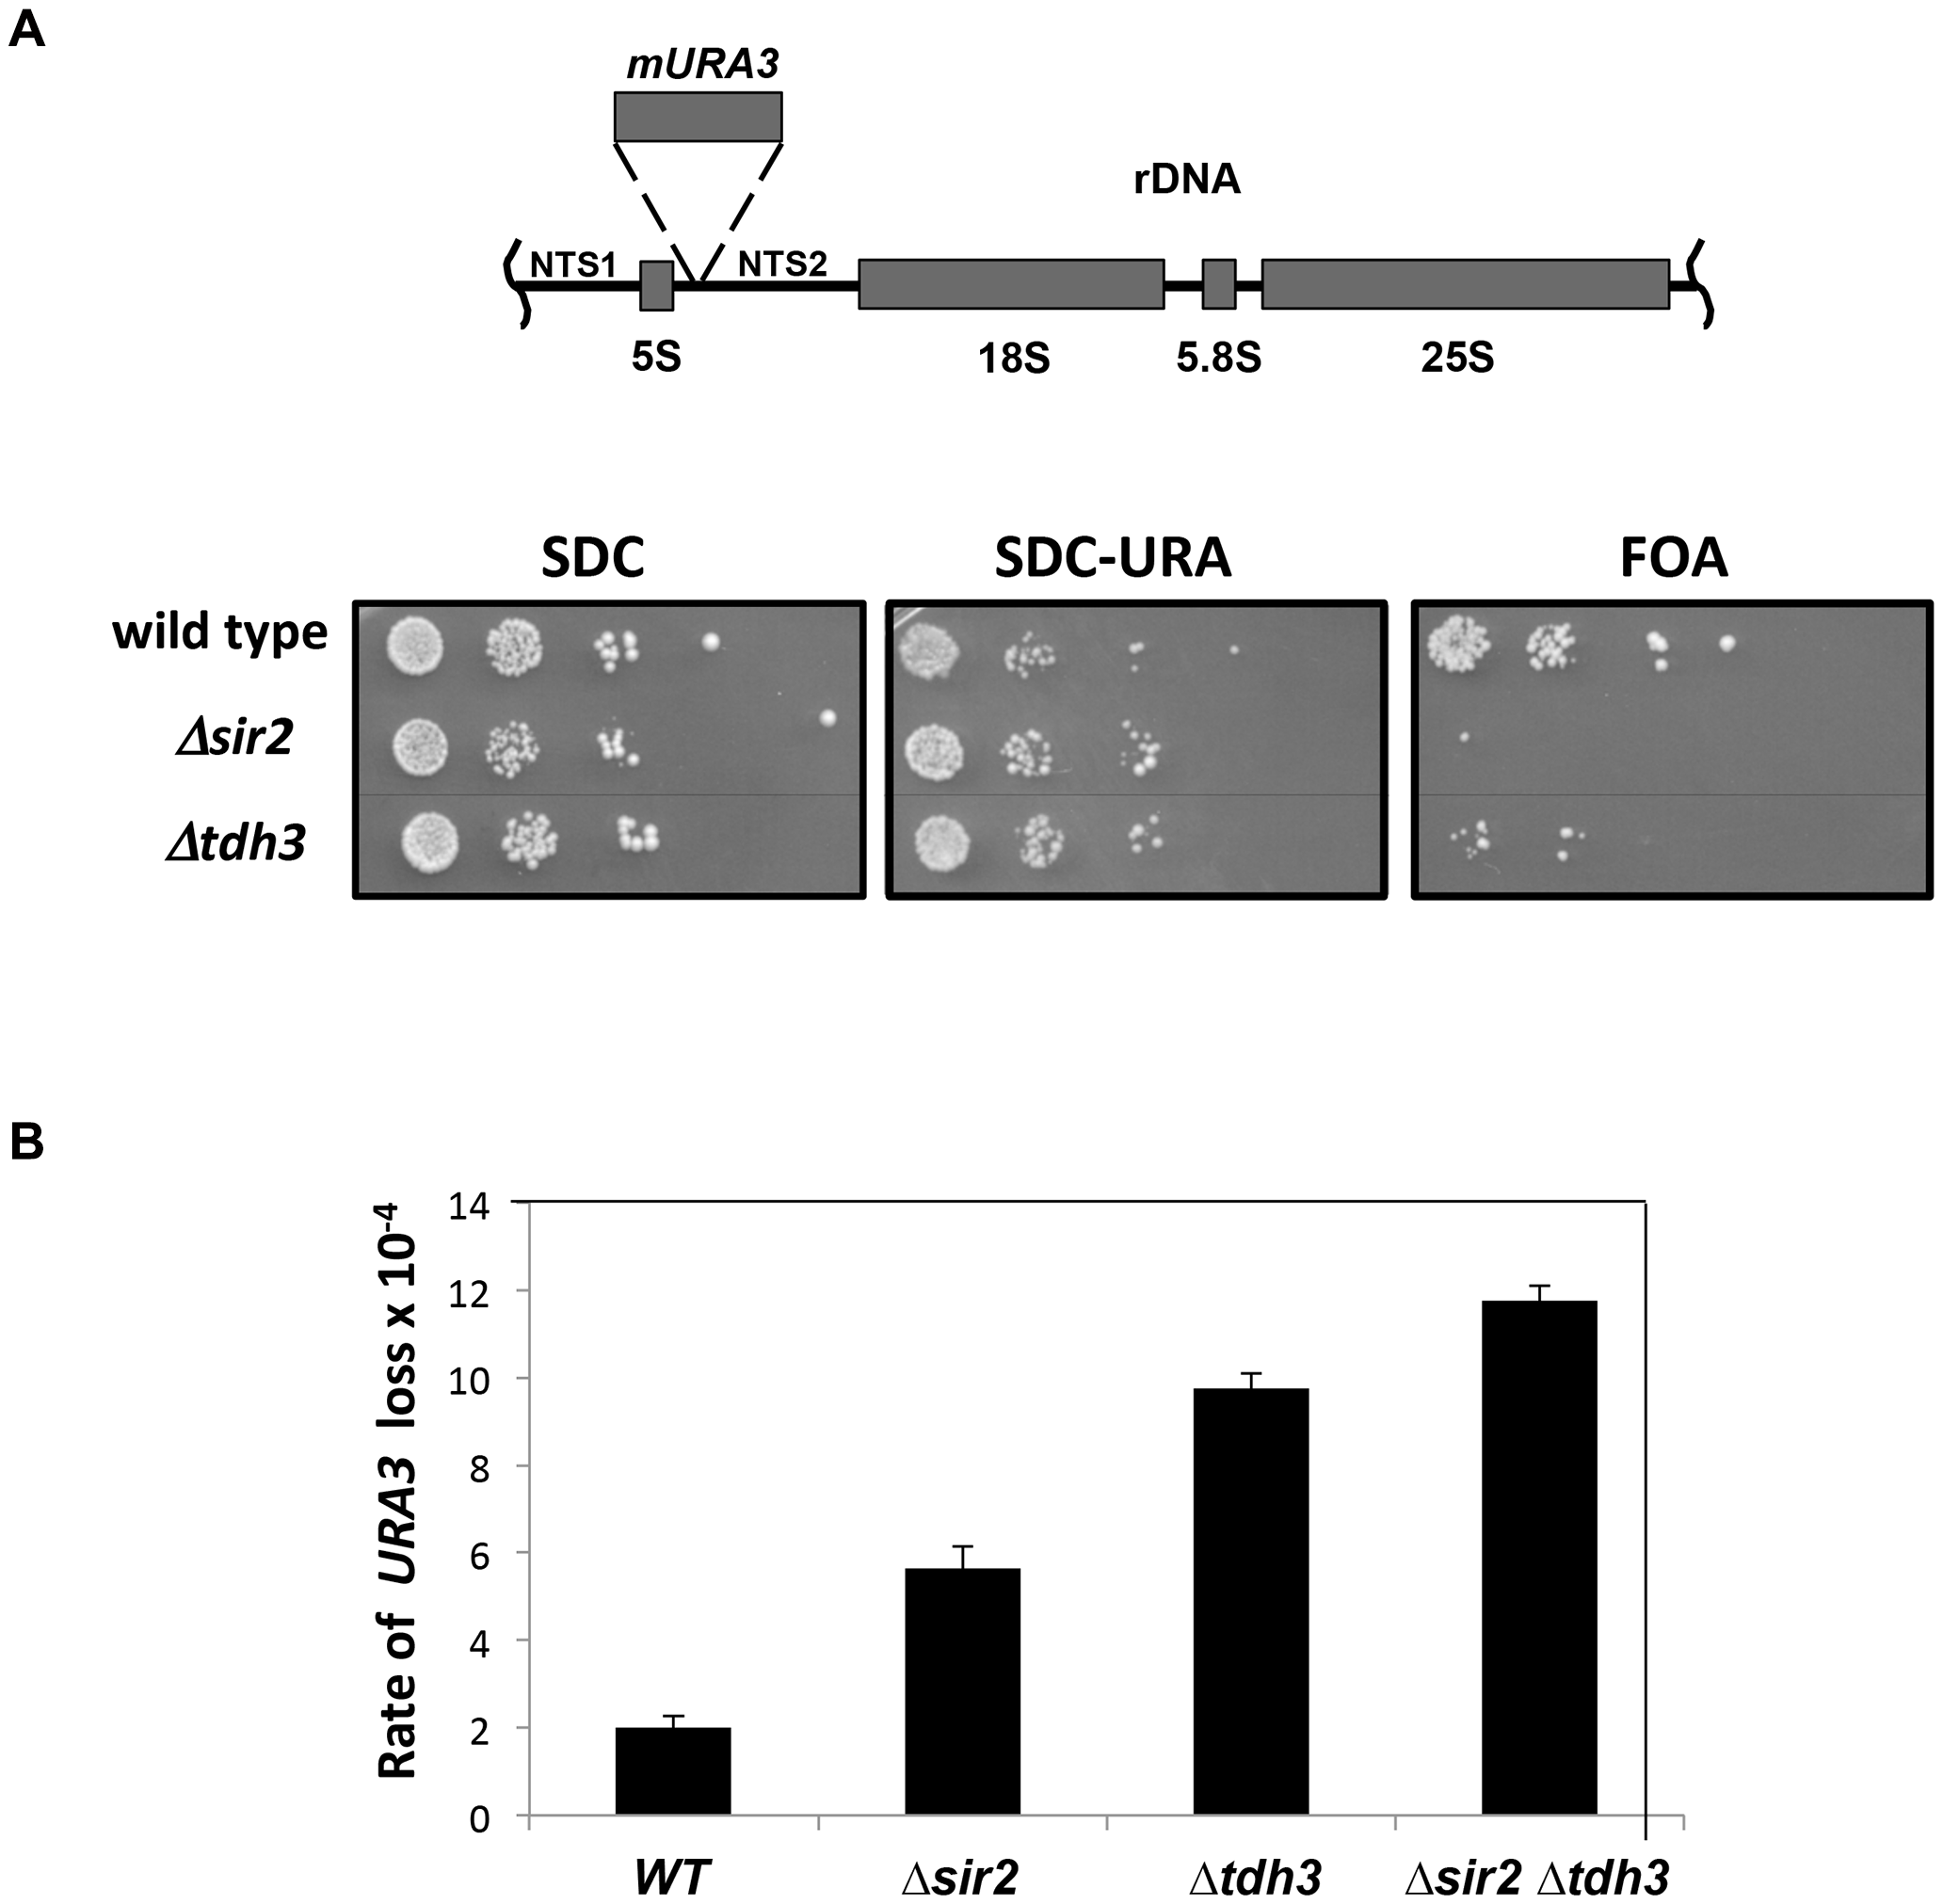 Tdh3 regulates silencing and recombination at the rDNA repeats.